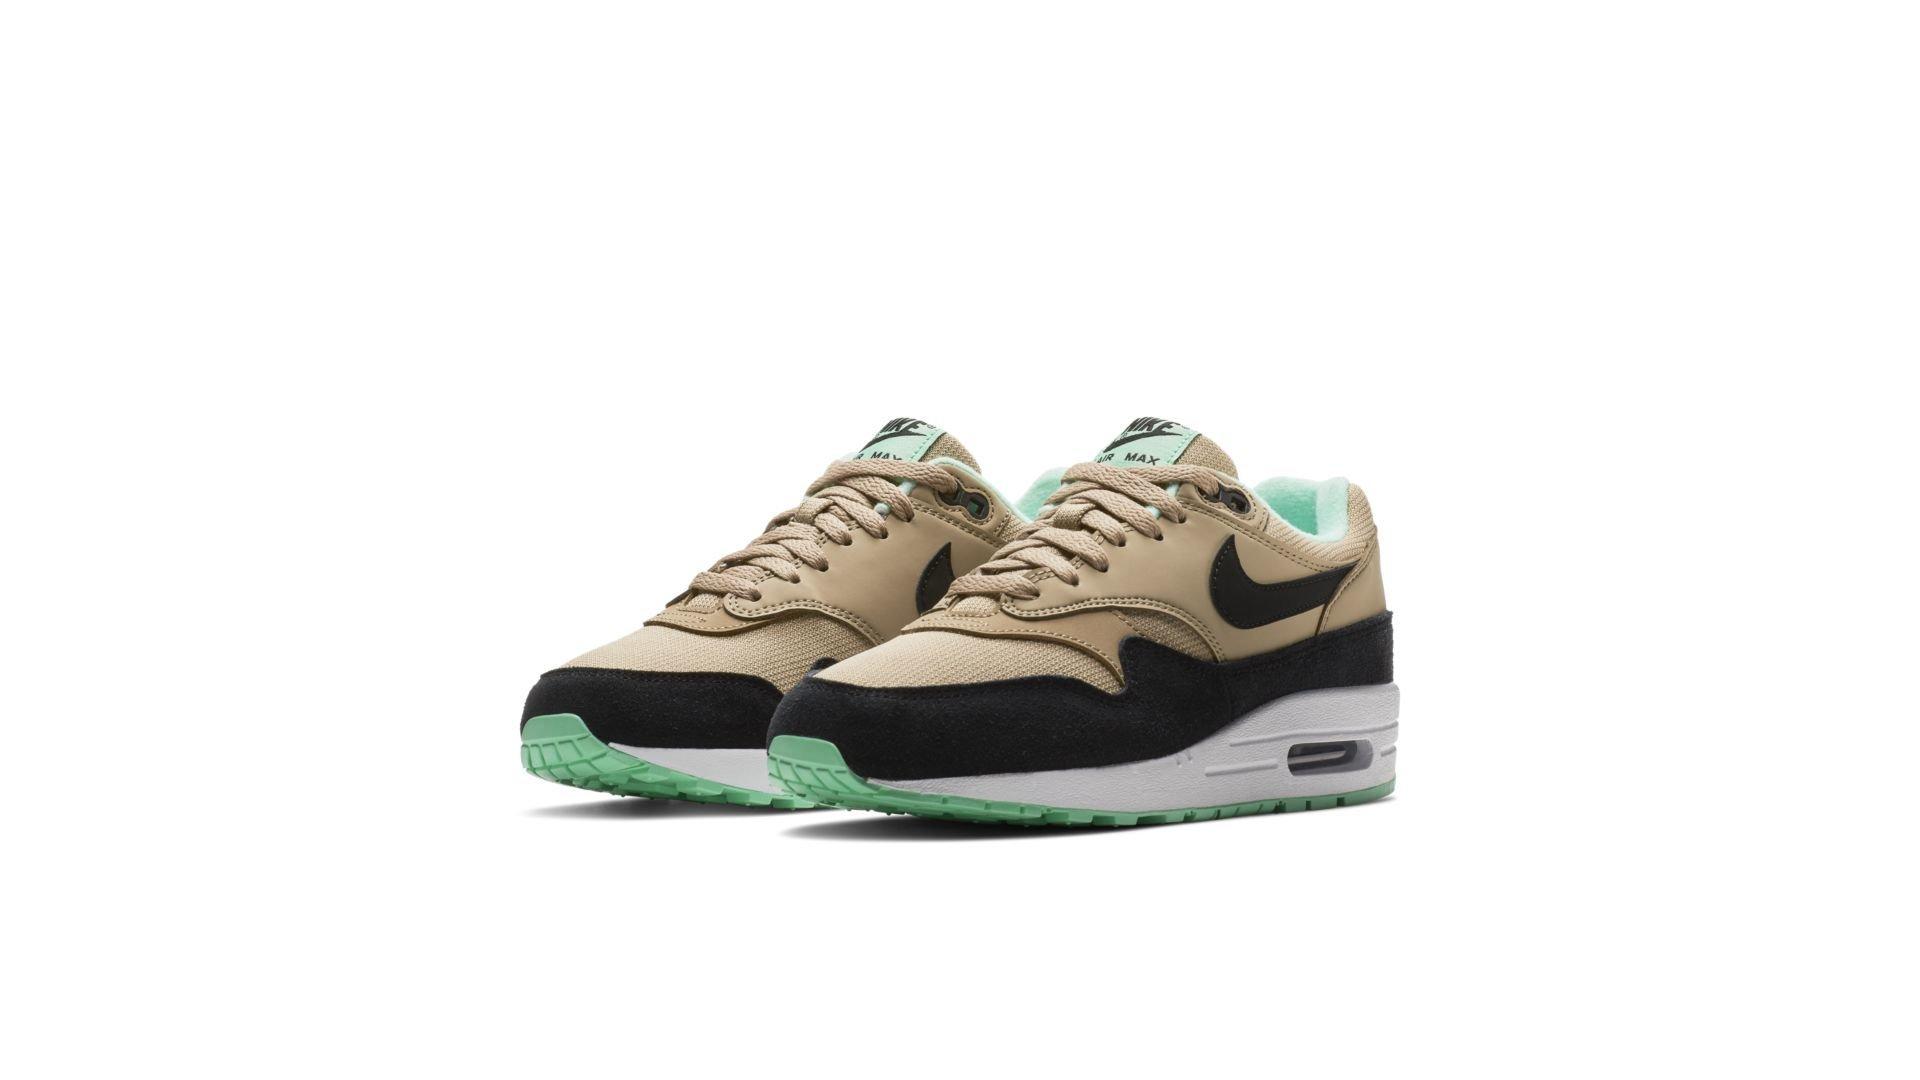 Nike WMNS Air Max 1 'Mint Green' | 319986 206